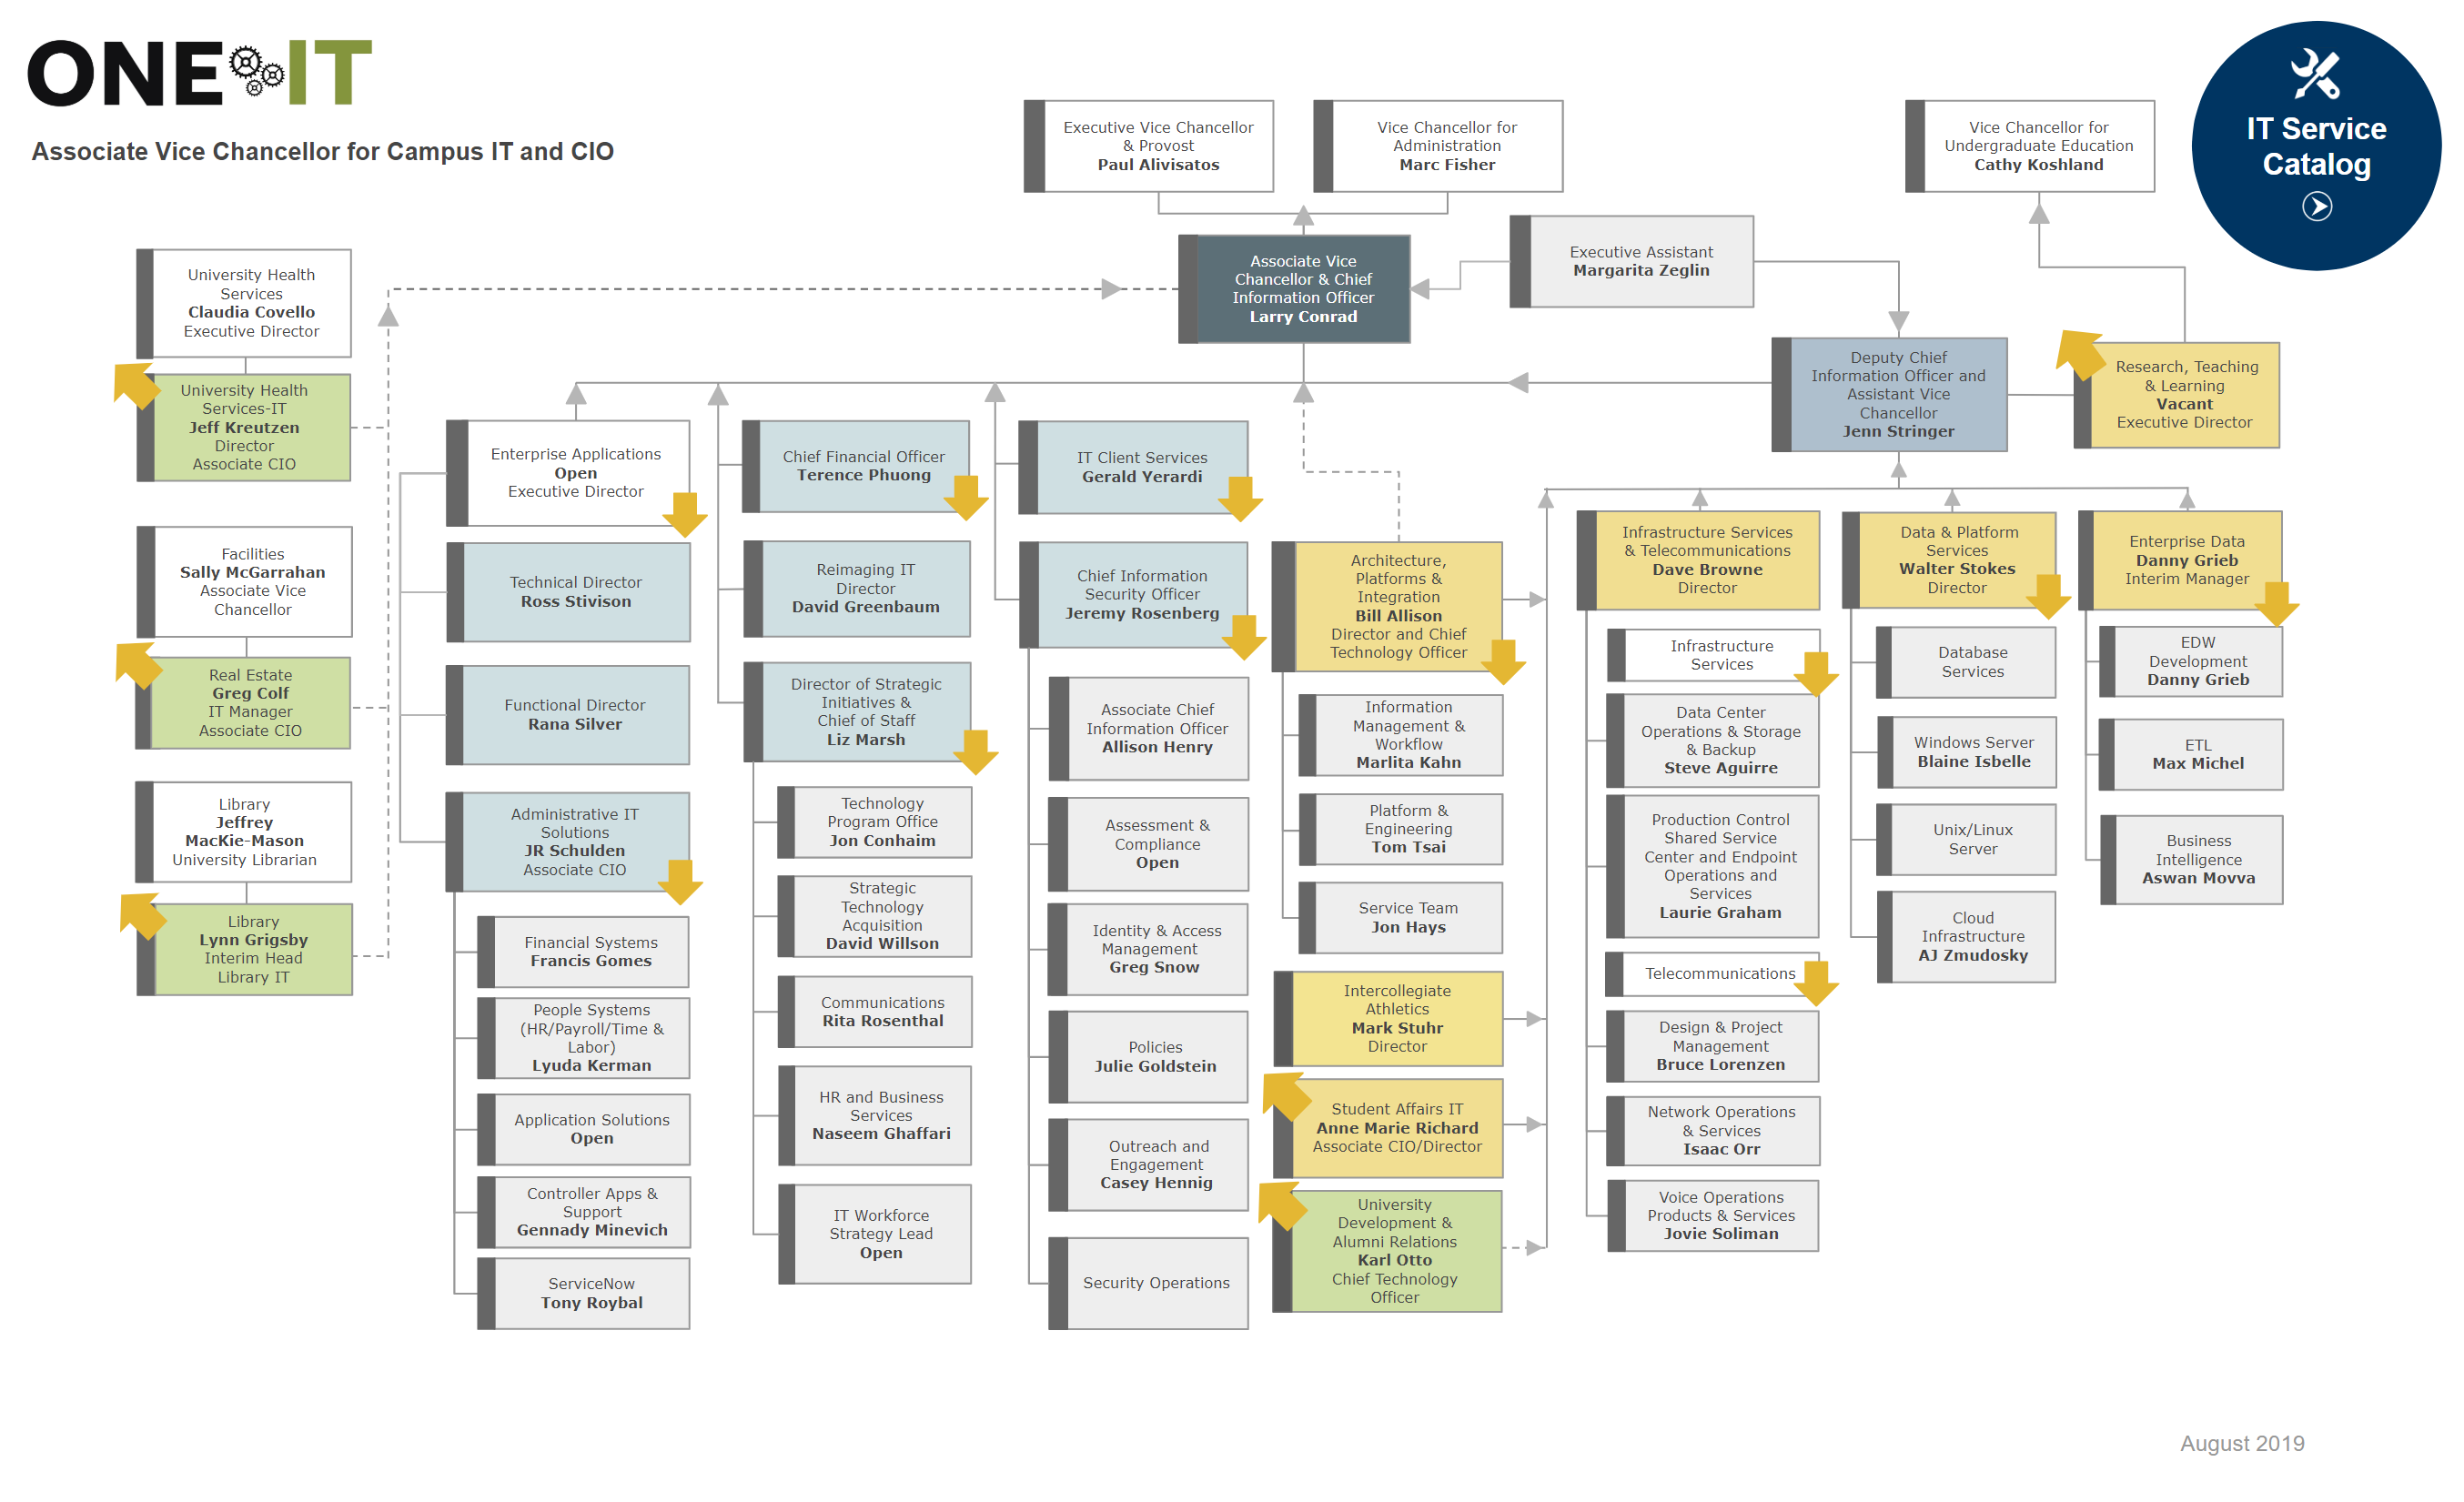 OCIO Org Chart top level image